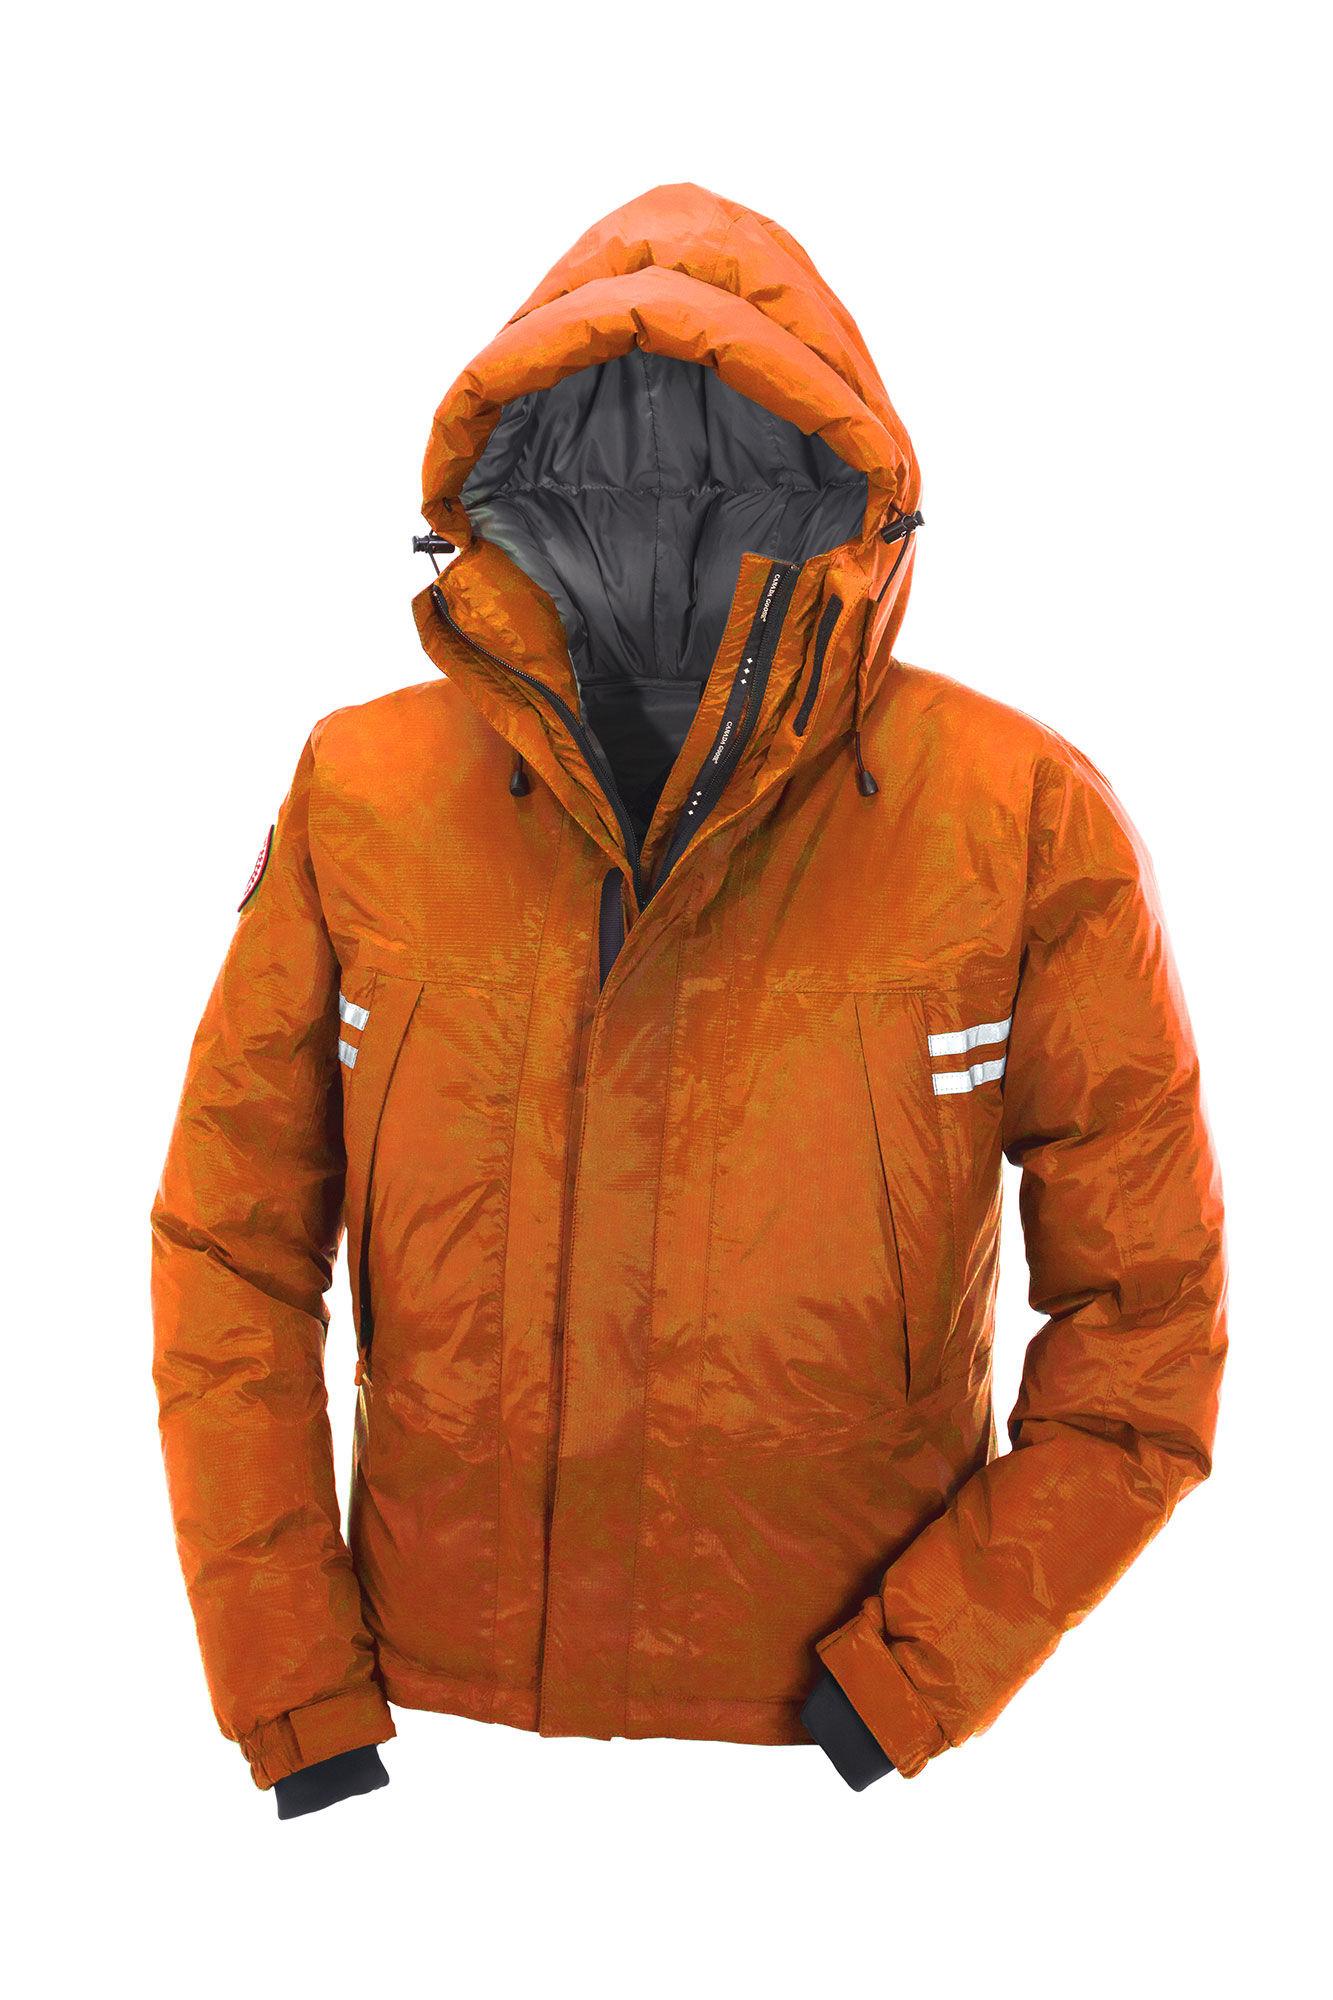 Canada Goose' Men's HyBridge Lite Jacket S - Sunsetorange